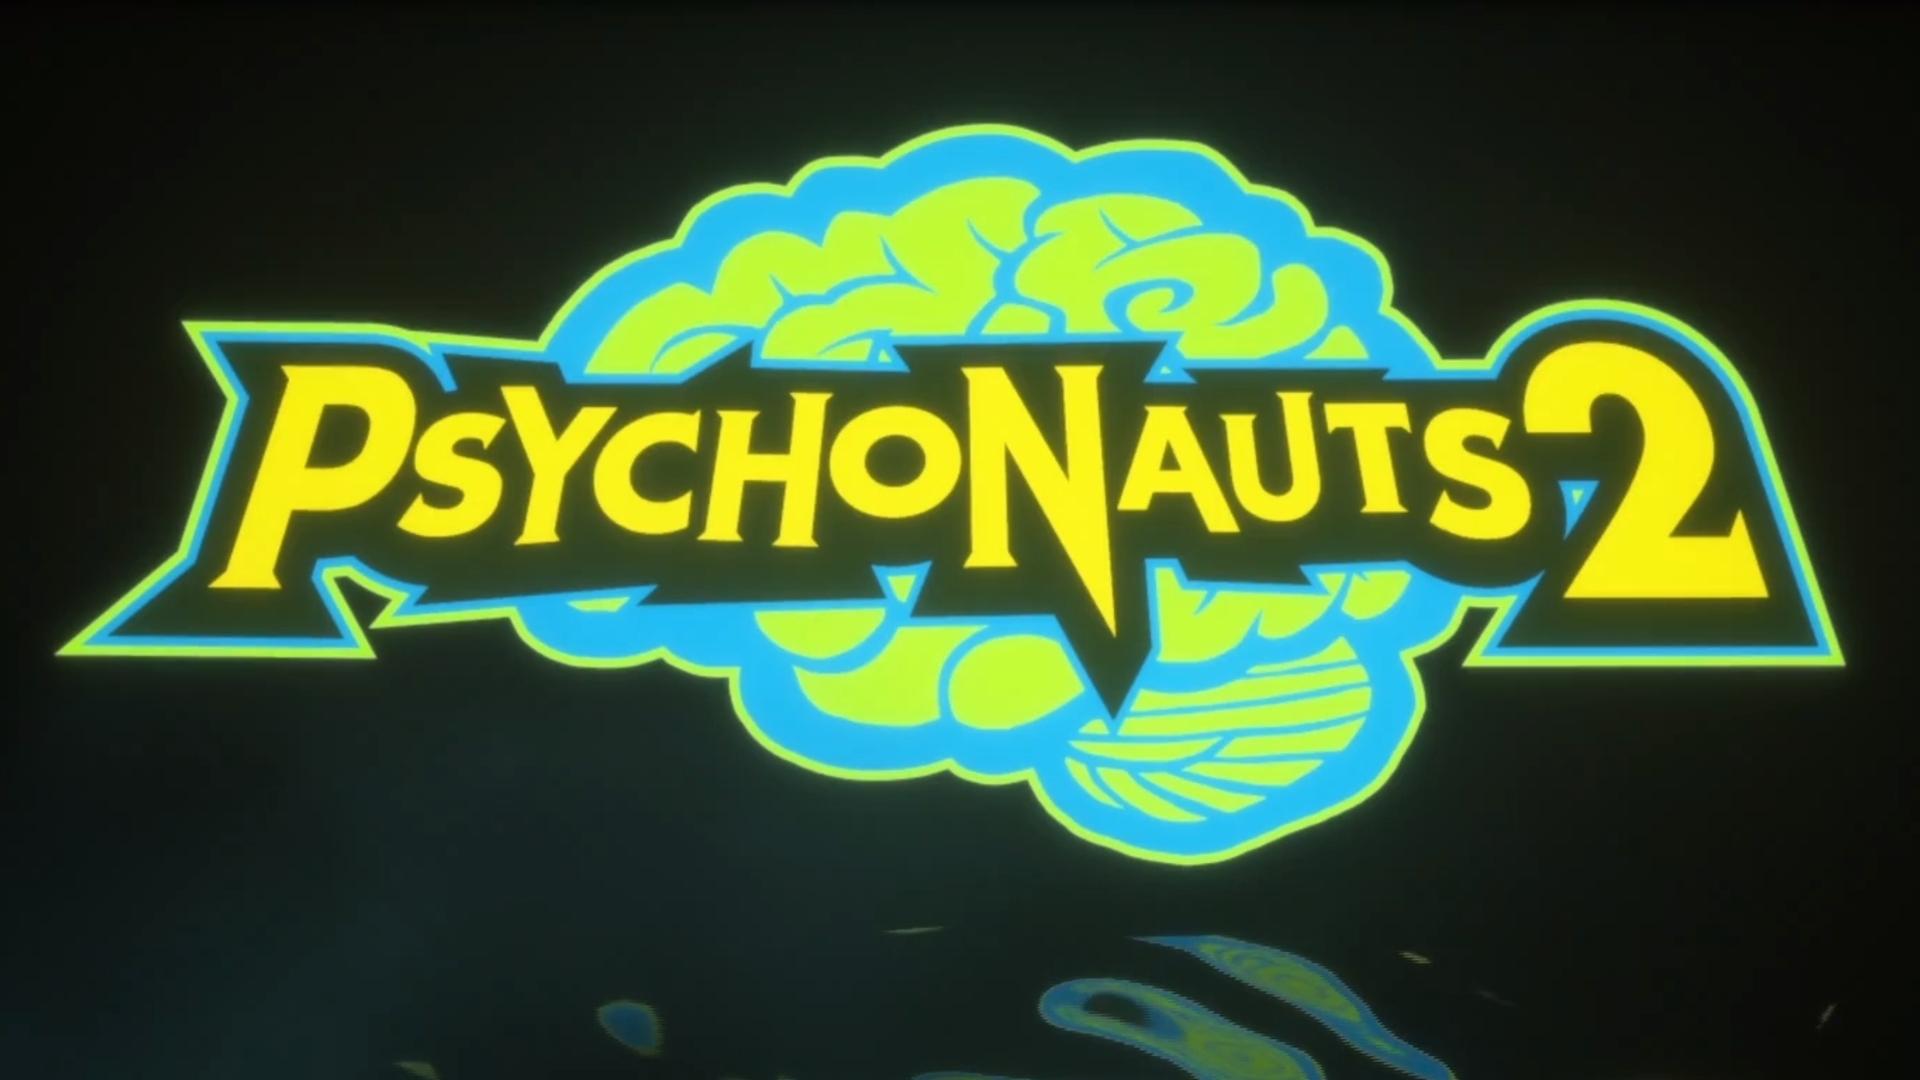 Psychonauts 2; screenshot: logo